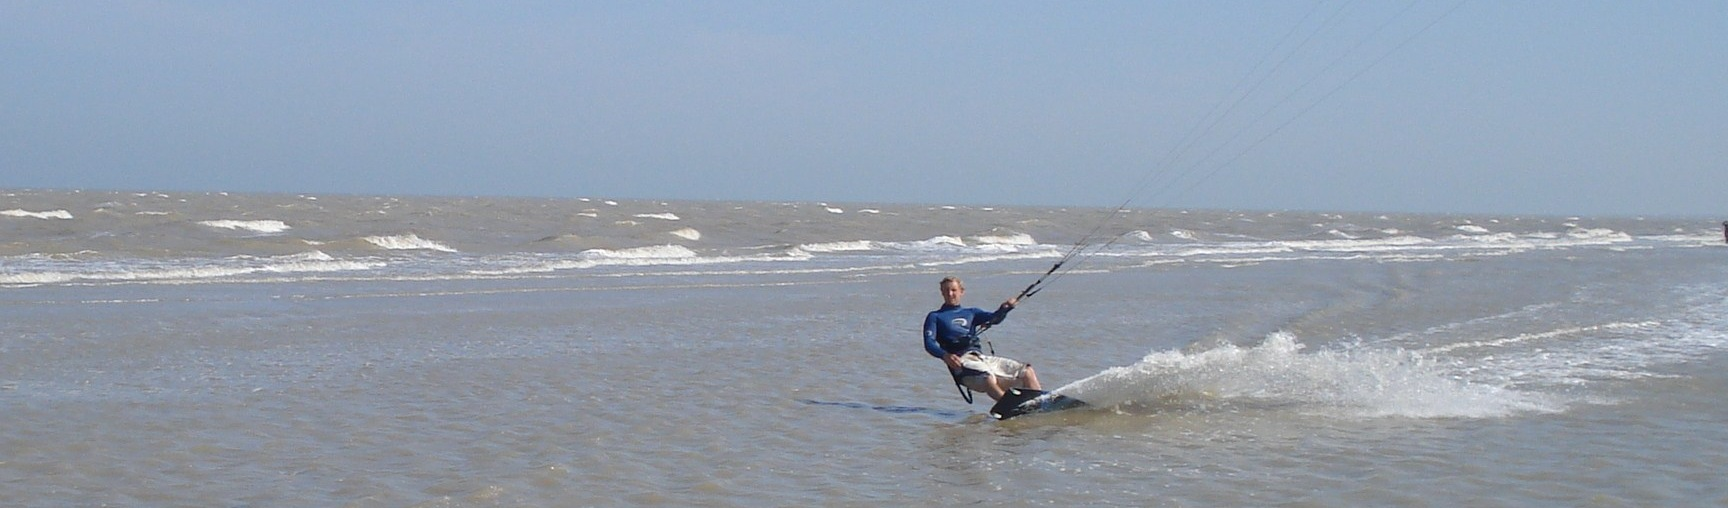 Kitesurfing South Coast